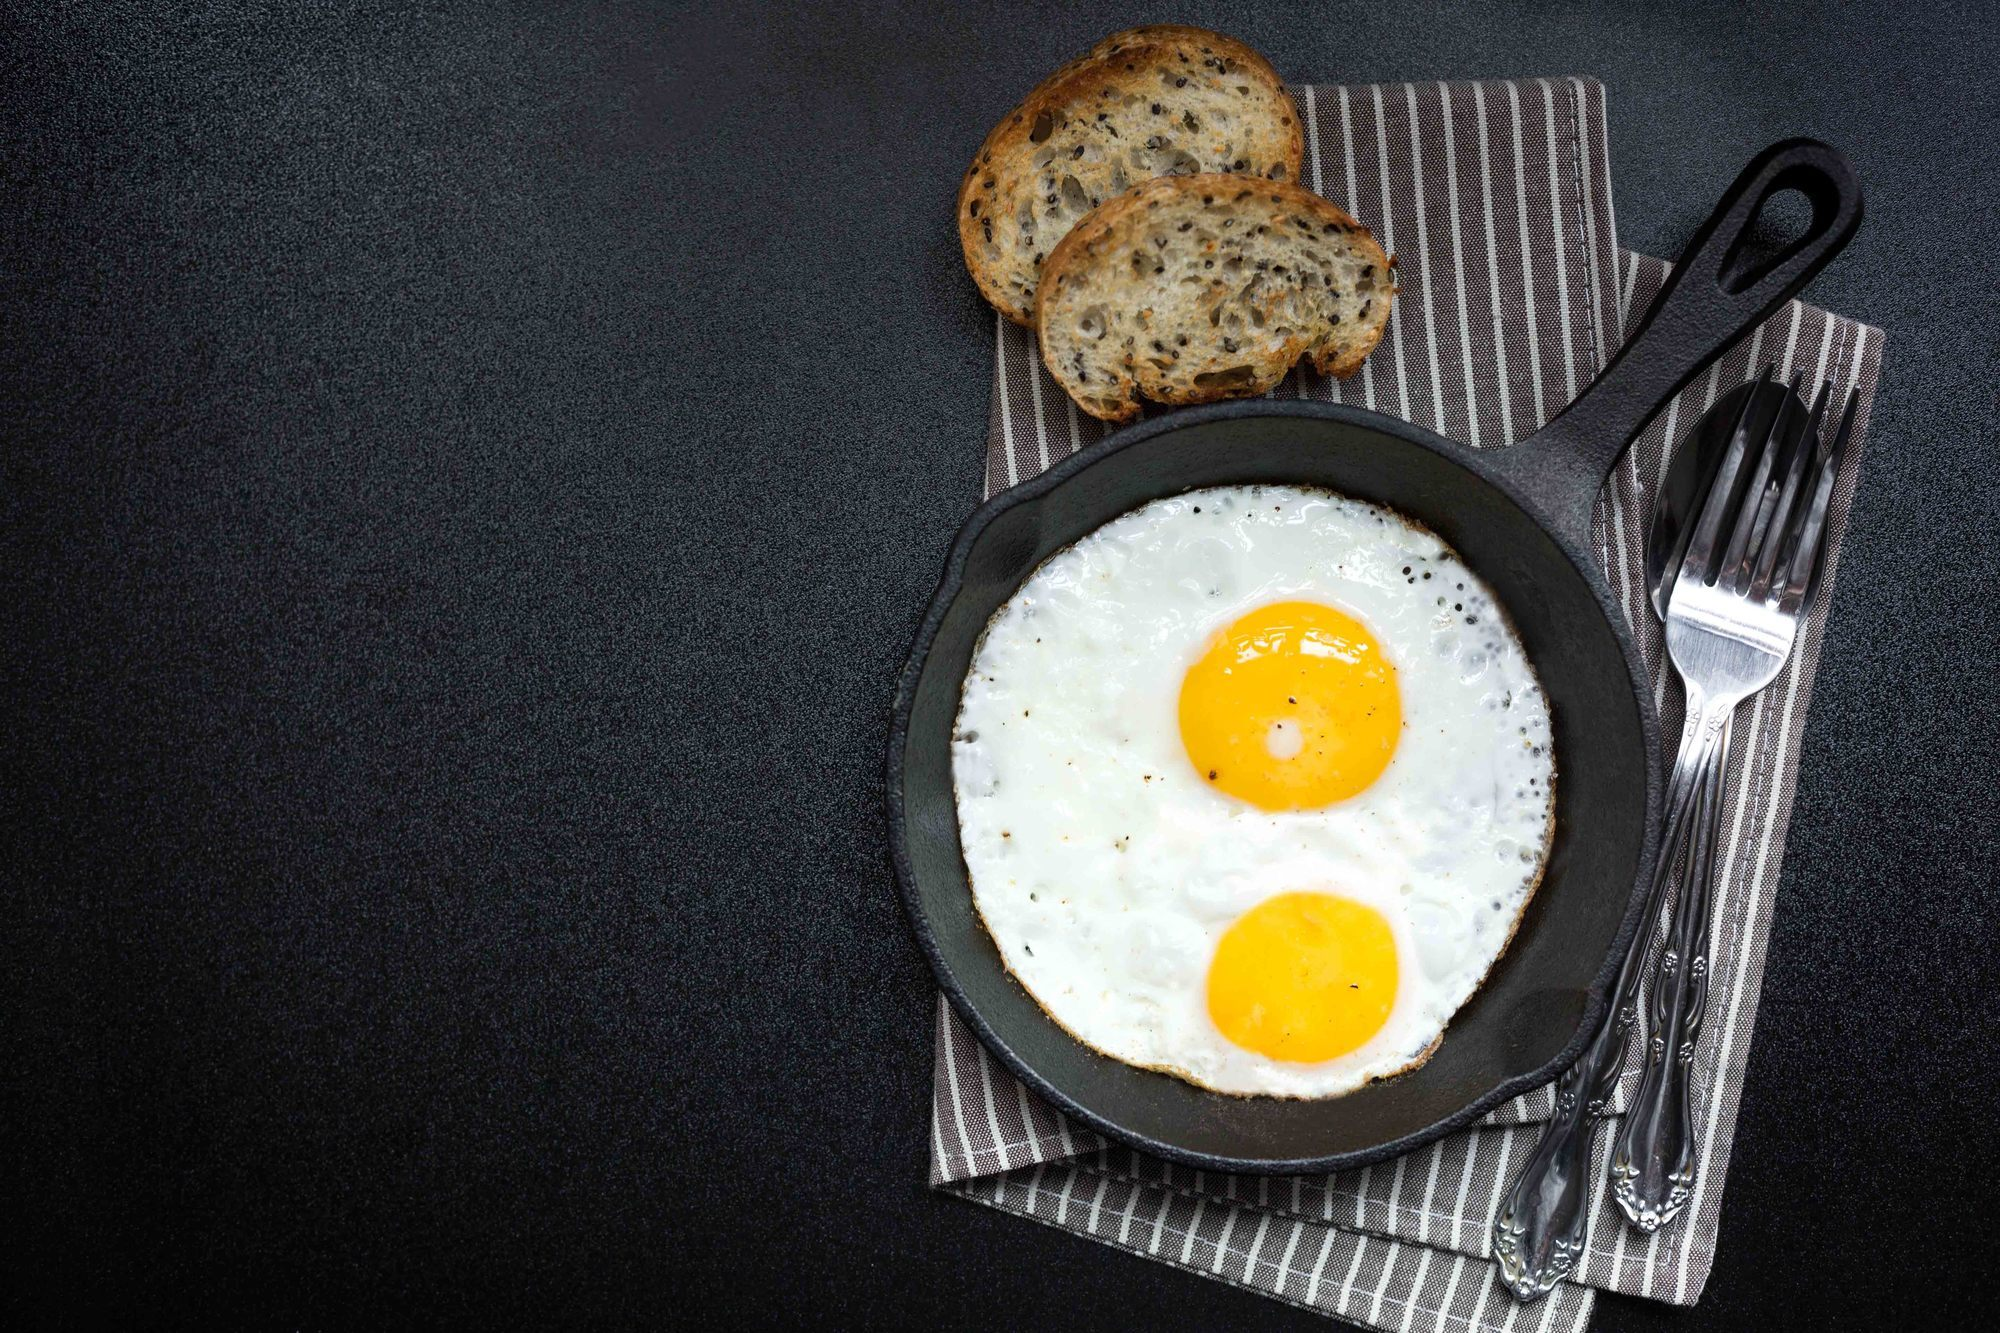 Langkah Mudah Membuat Telur Mata Sapi Masak Apa Hari Ini